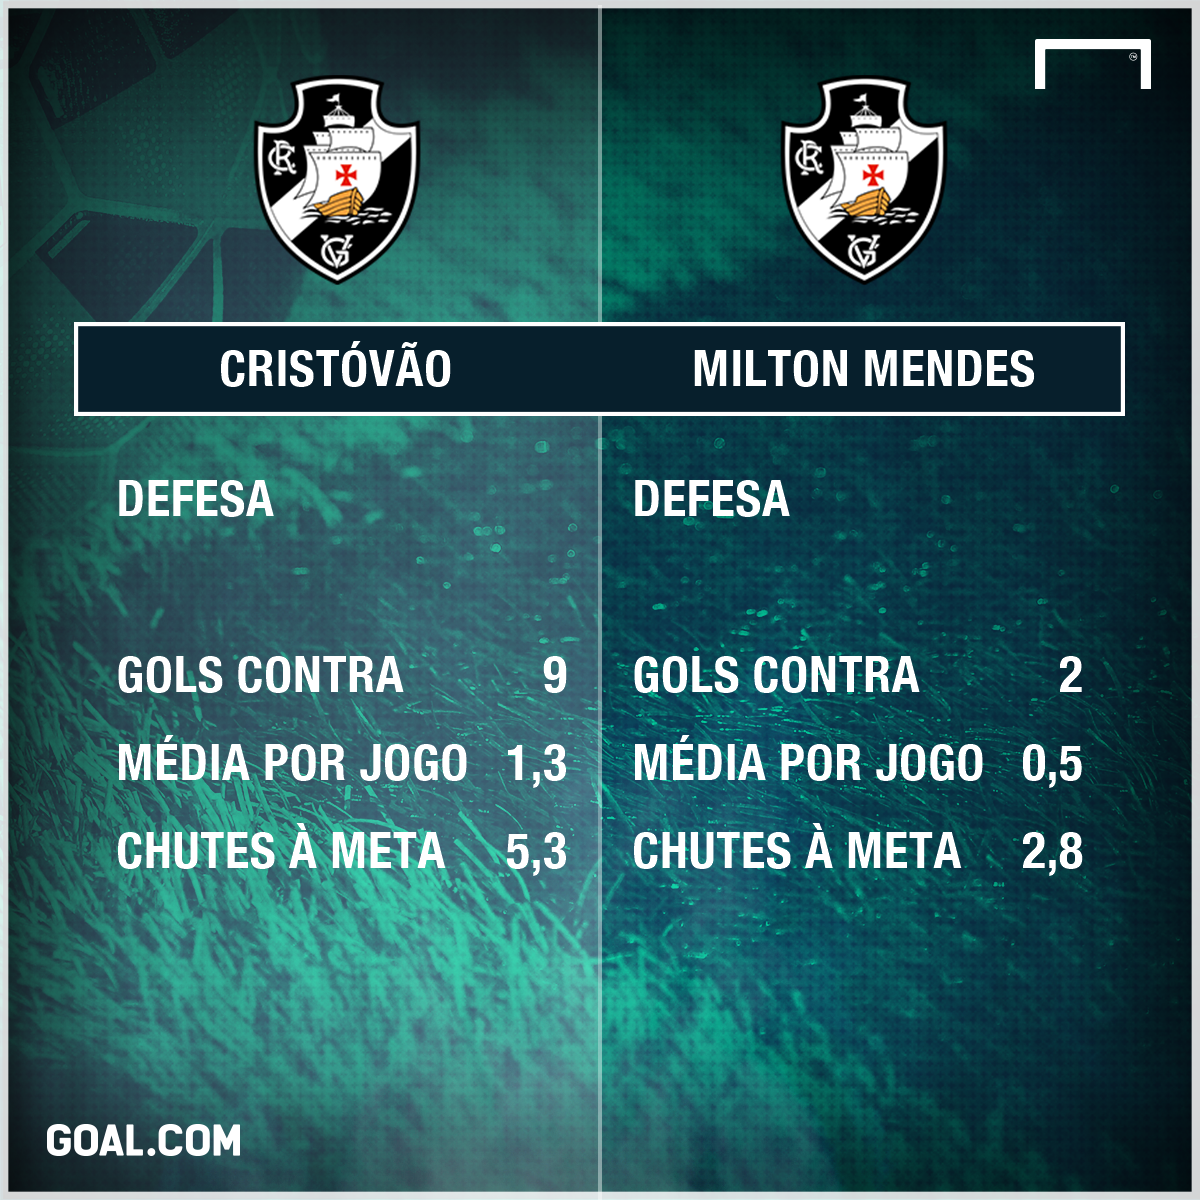 GFX Cristovão vs Milton mendes Vasco